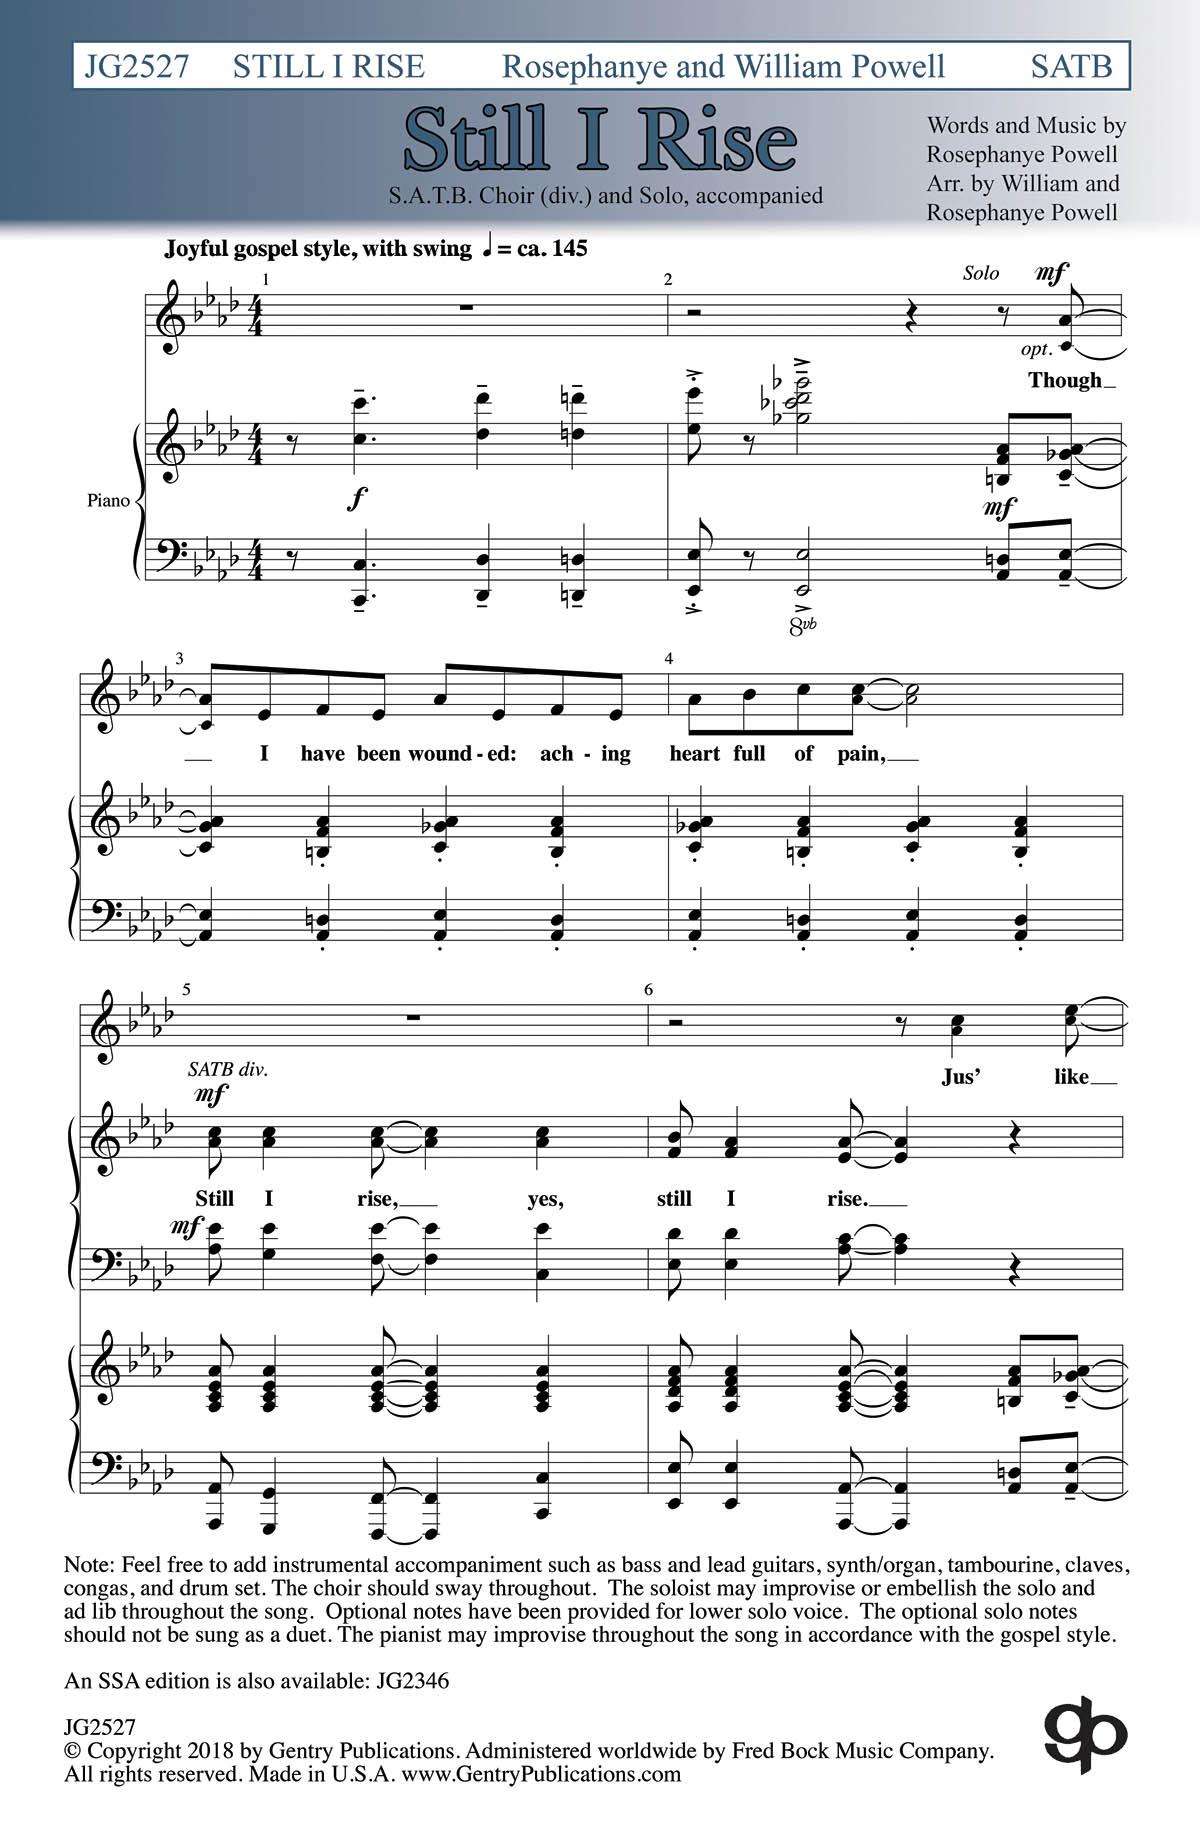 Rosephanye Powell: Still I Rise: Mixed Choir a Cappella: Vocal Score